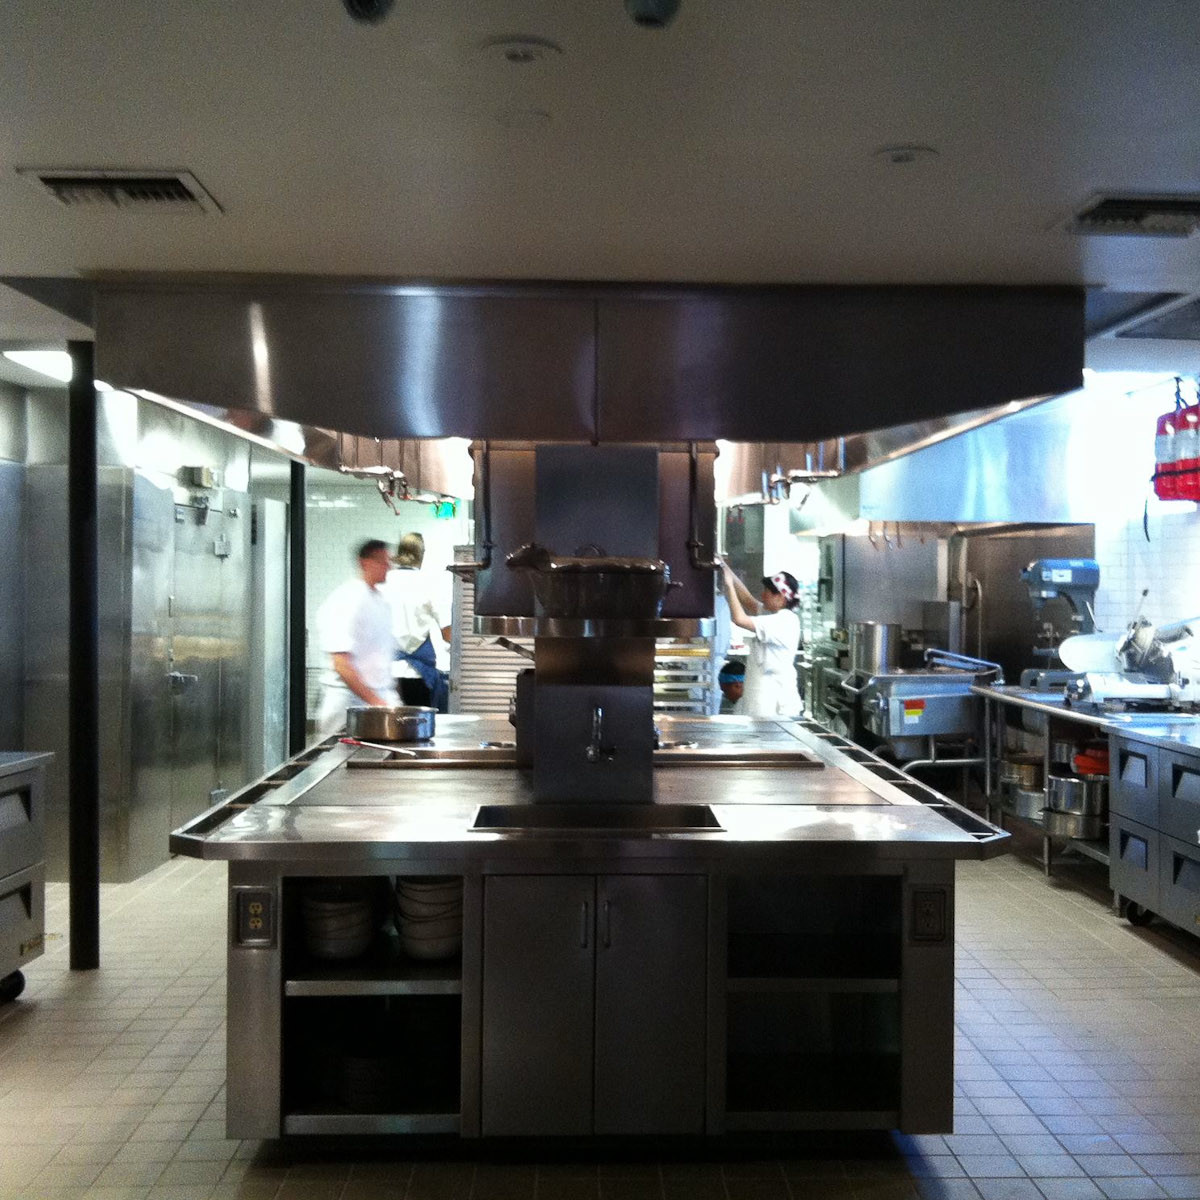 Restaurant Kitchen Pass: Where To Eat Right Now: 10 Hot, Must-try Houston Restaurants For Oc...